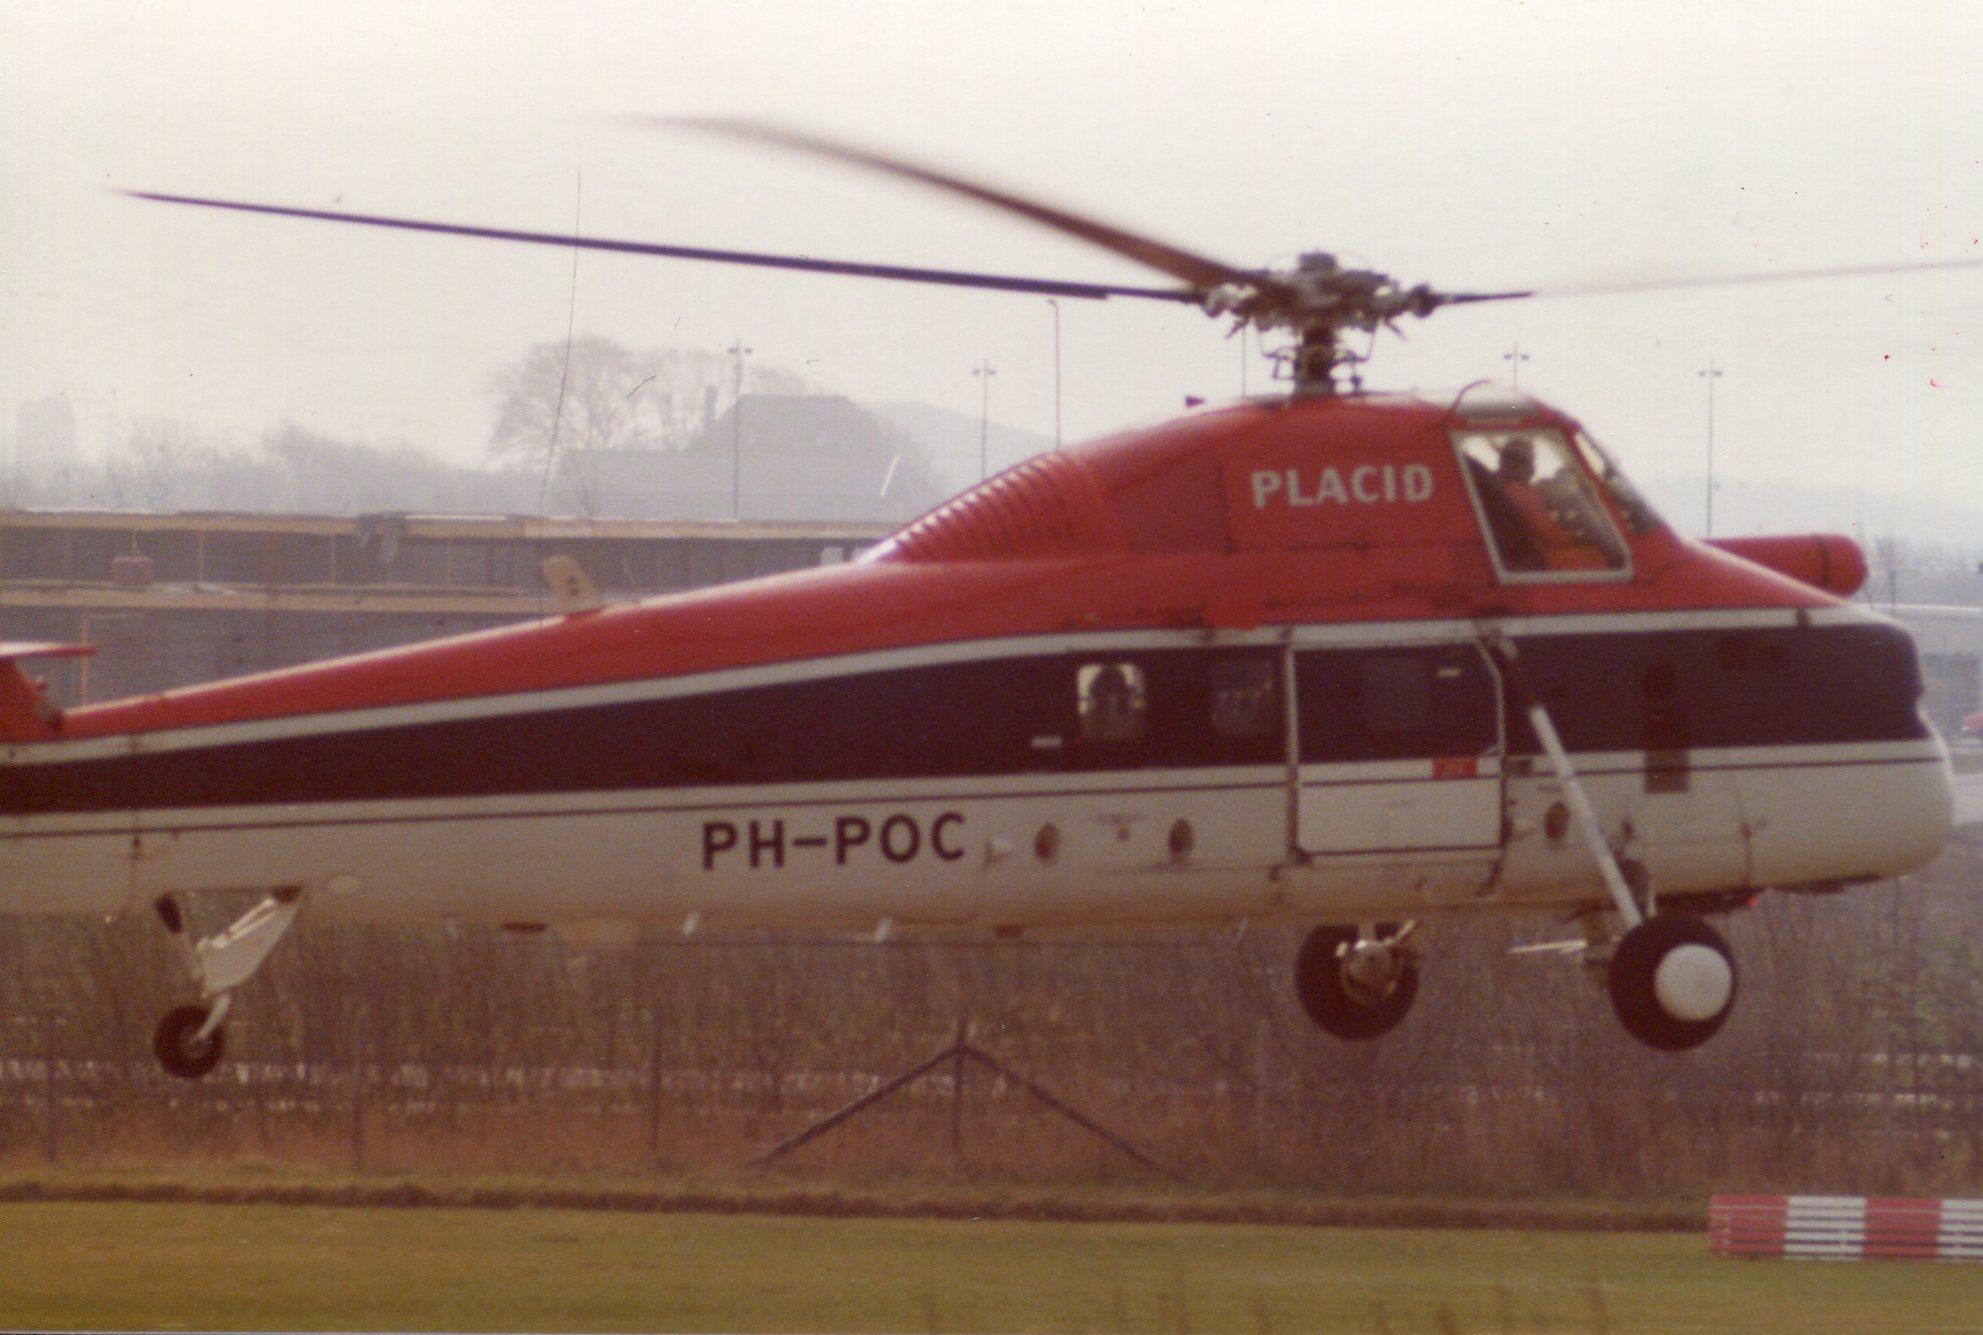 Naam: Den Helder , april 1977.jpg Bekeken: 410 Grootte: 279,4 KB